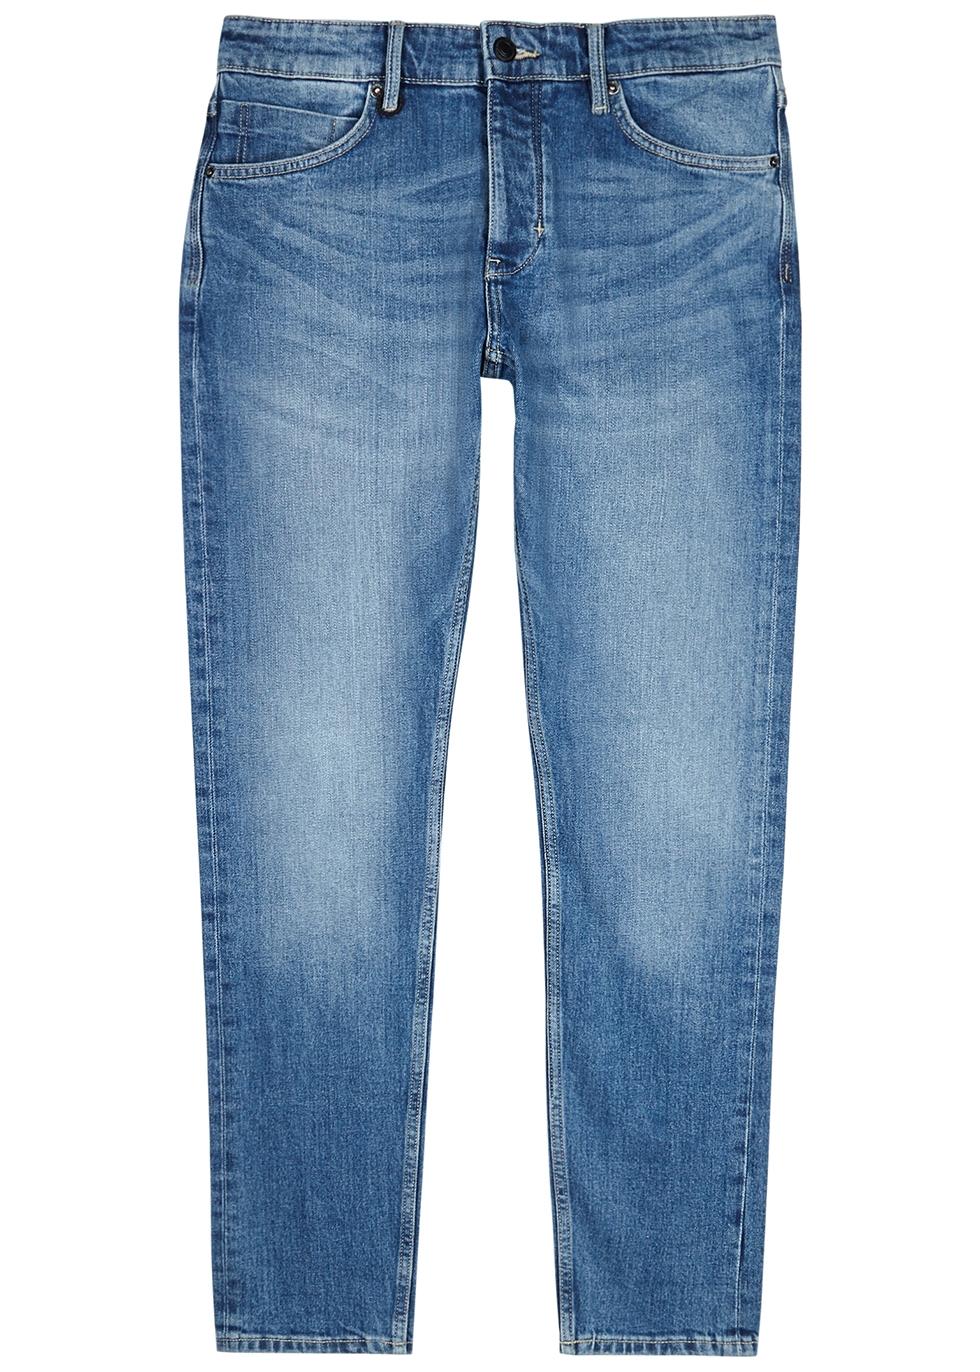 Iggy blue skinny jeans